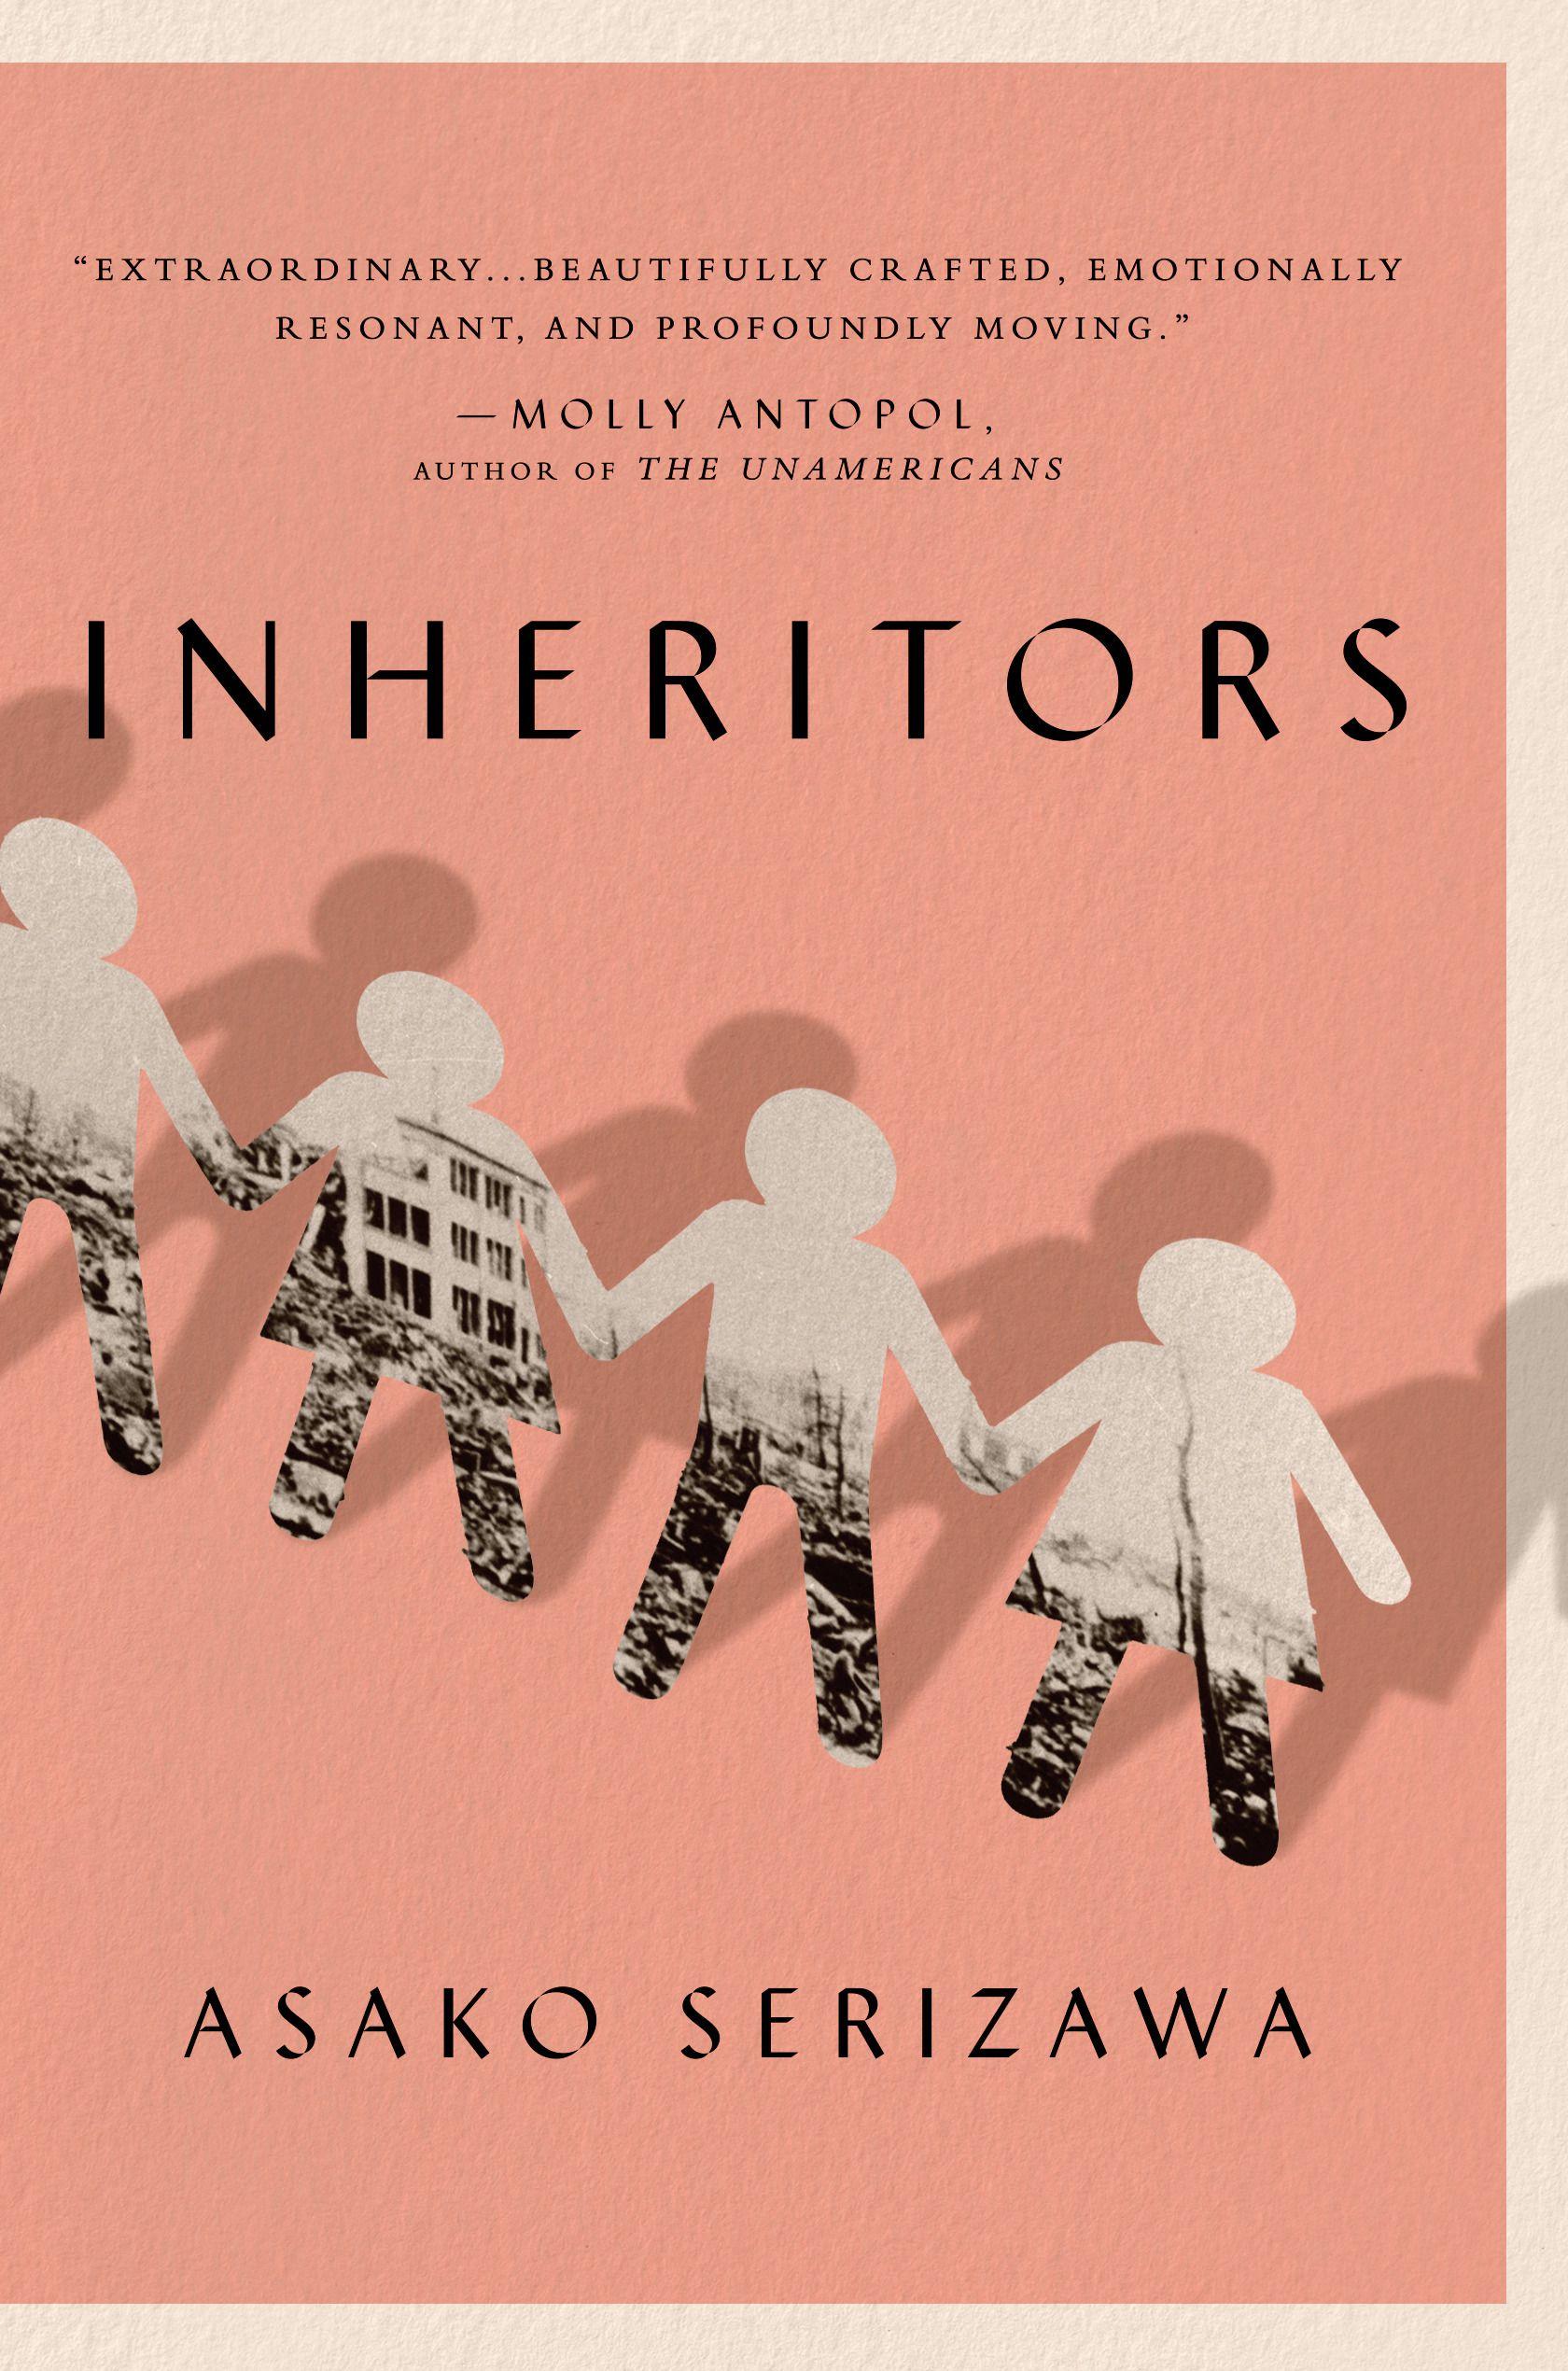 cover of Inheritors by Asako Serizawa